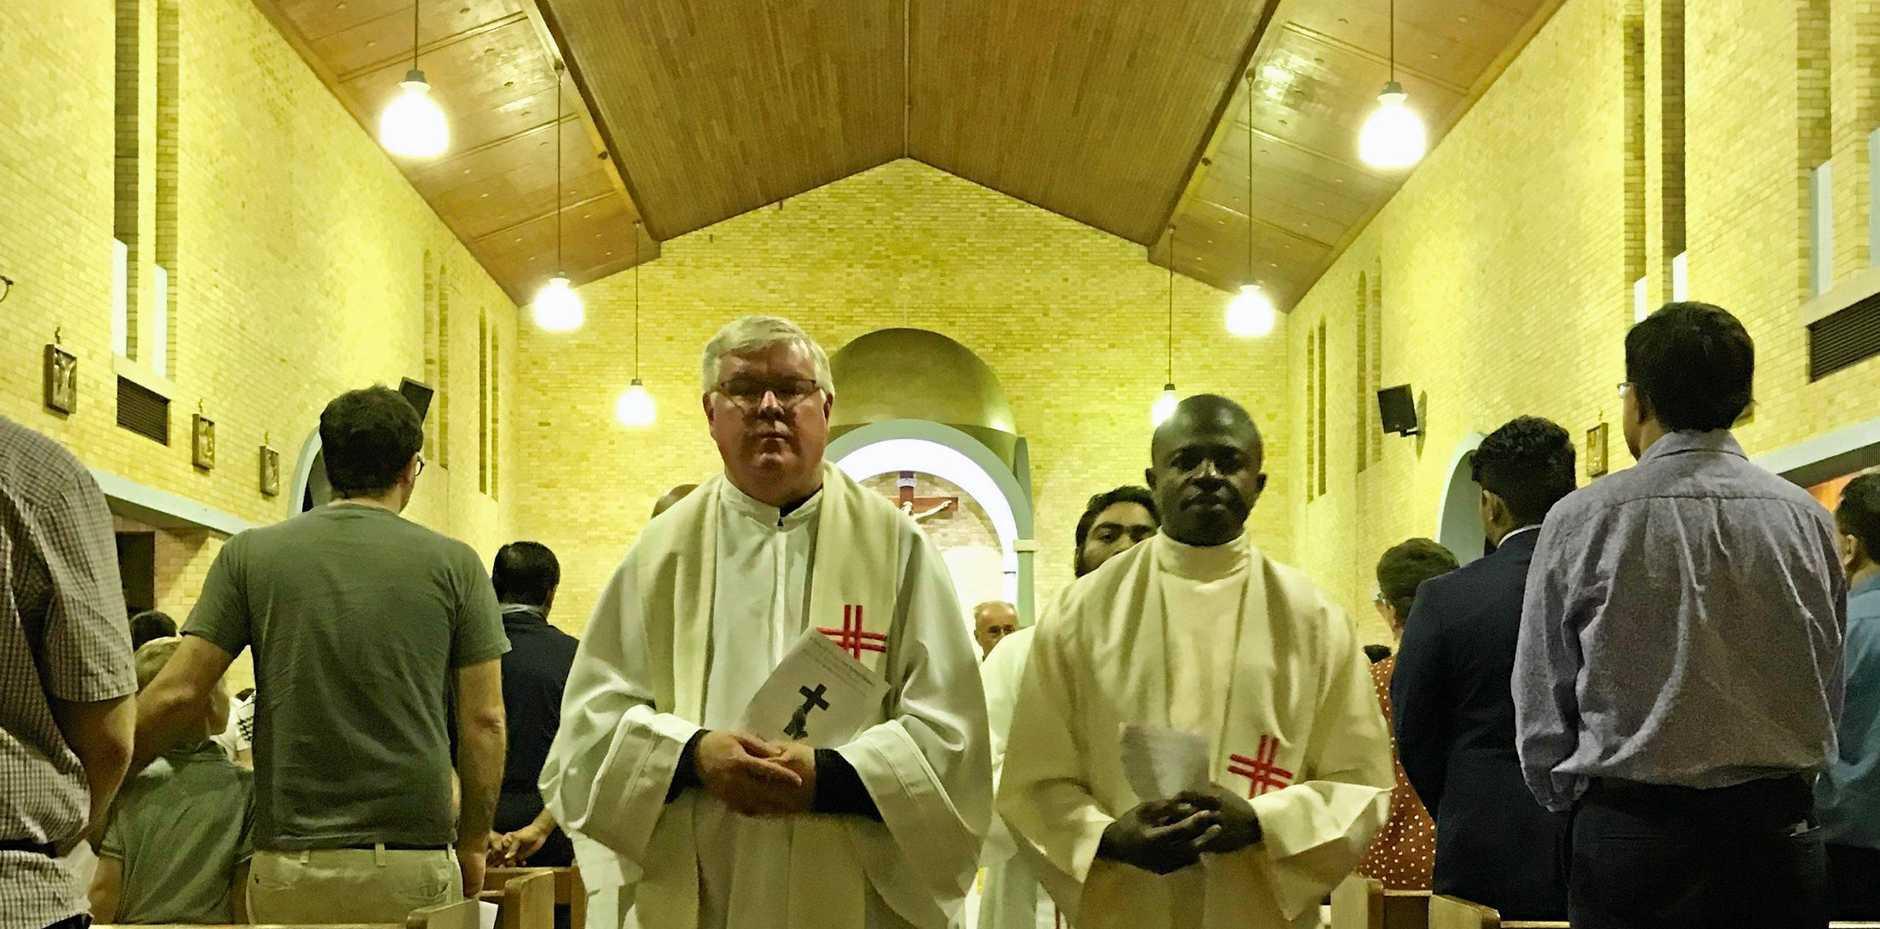 Friar Stephen Hanly and Friar James Ezeucha.